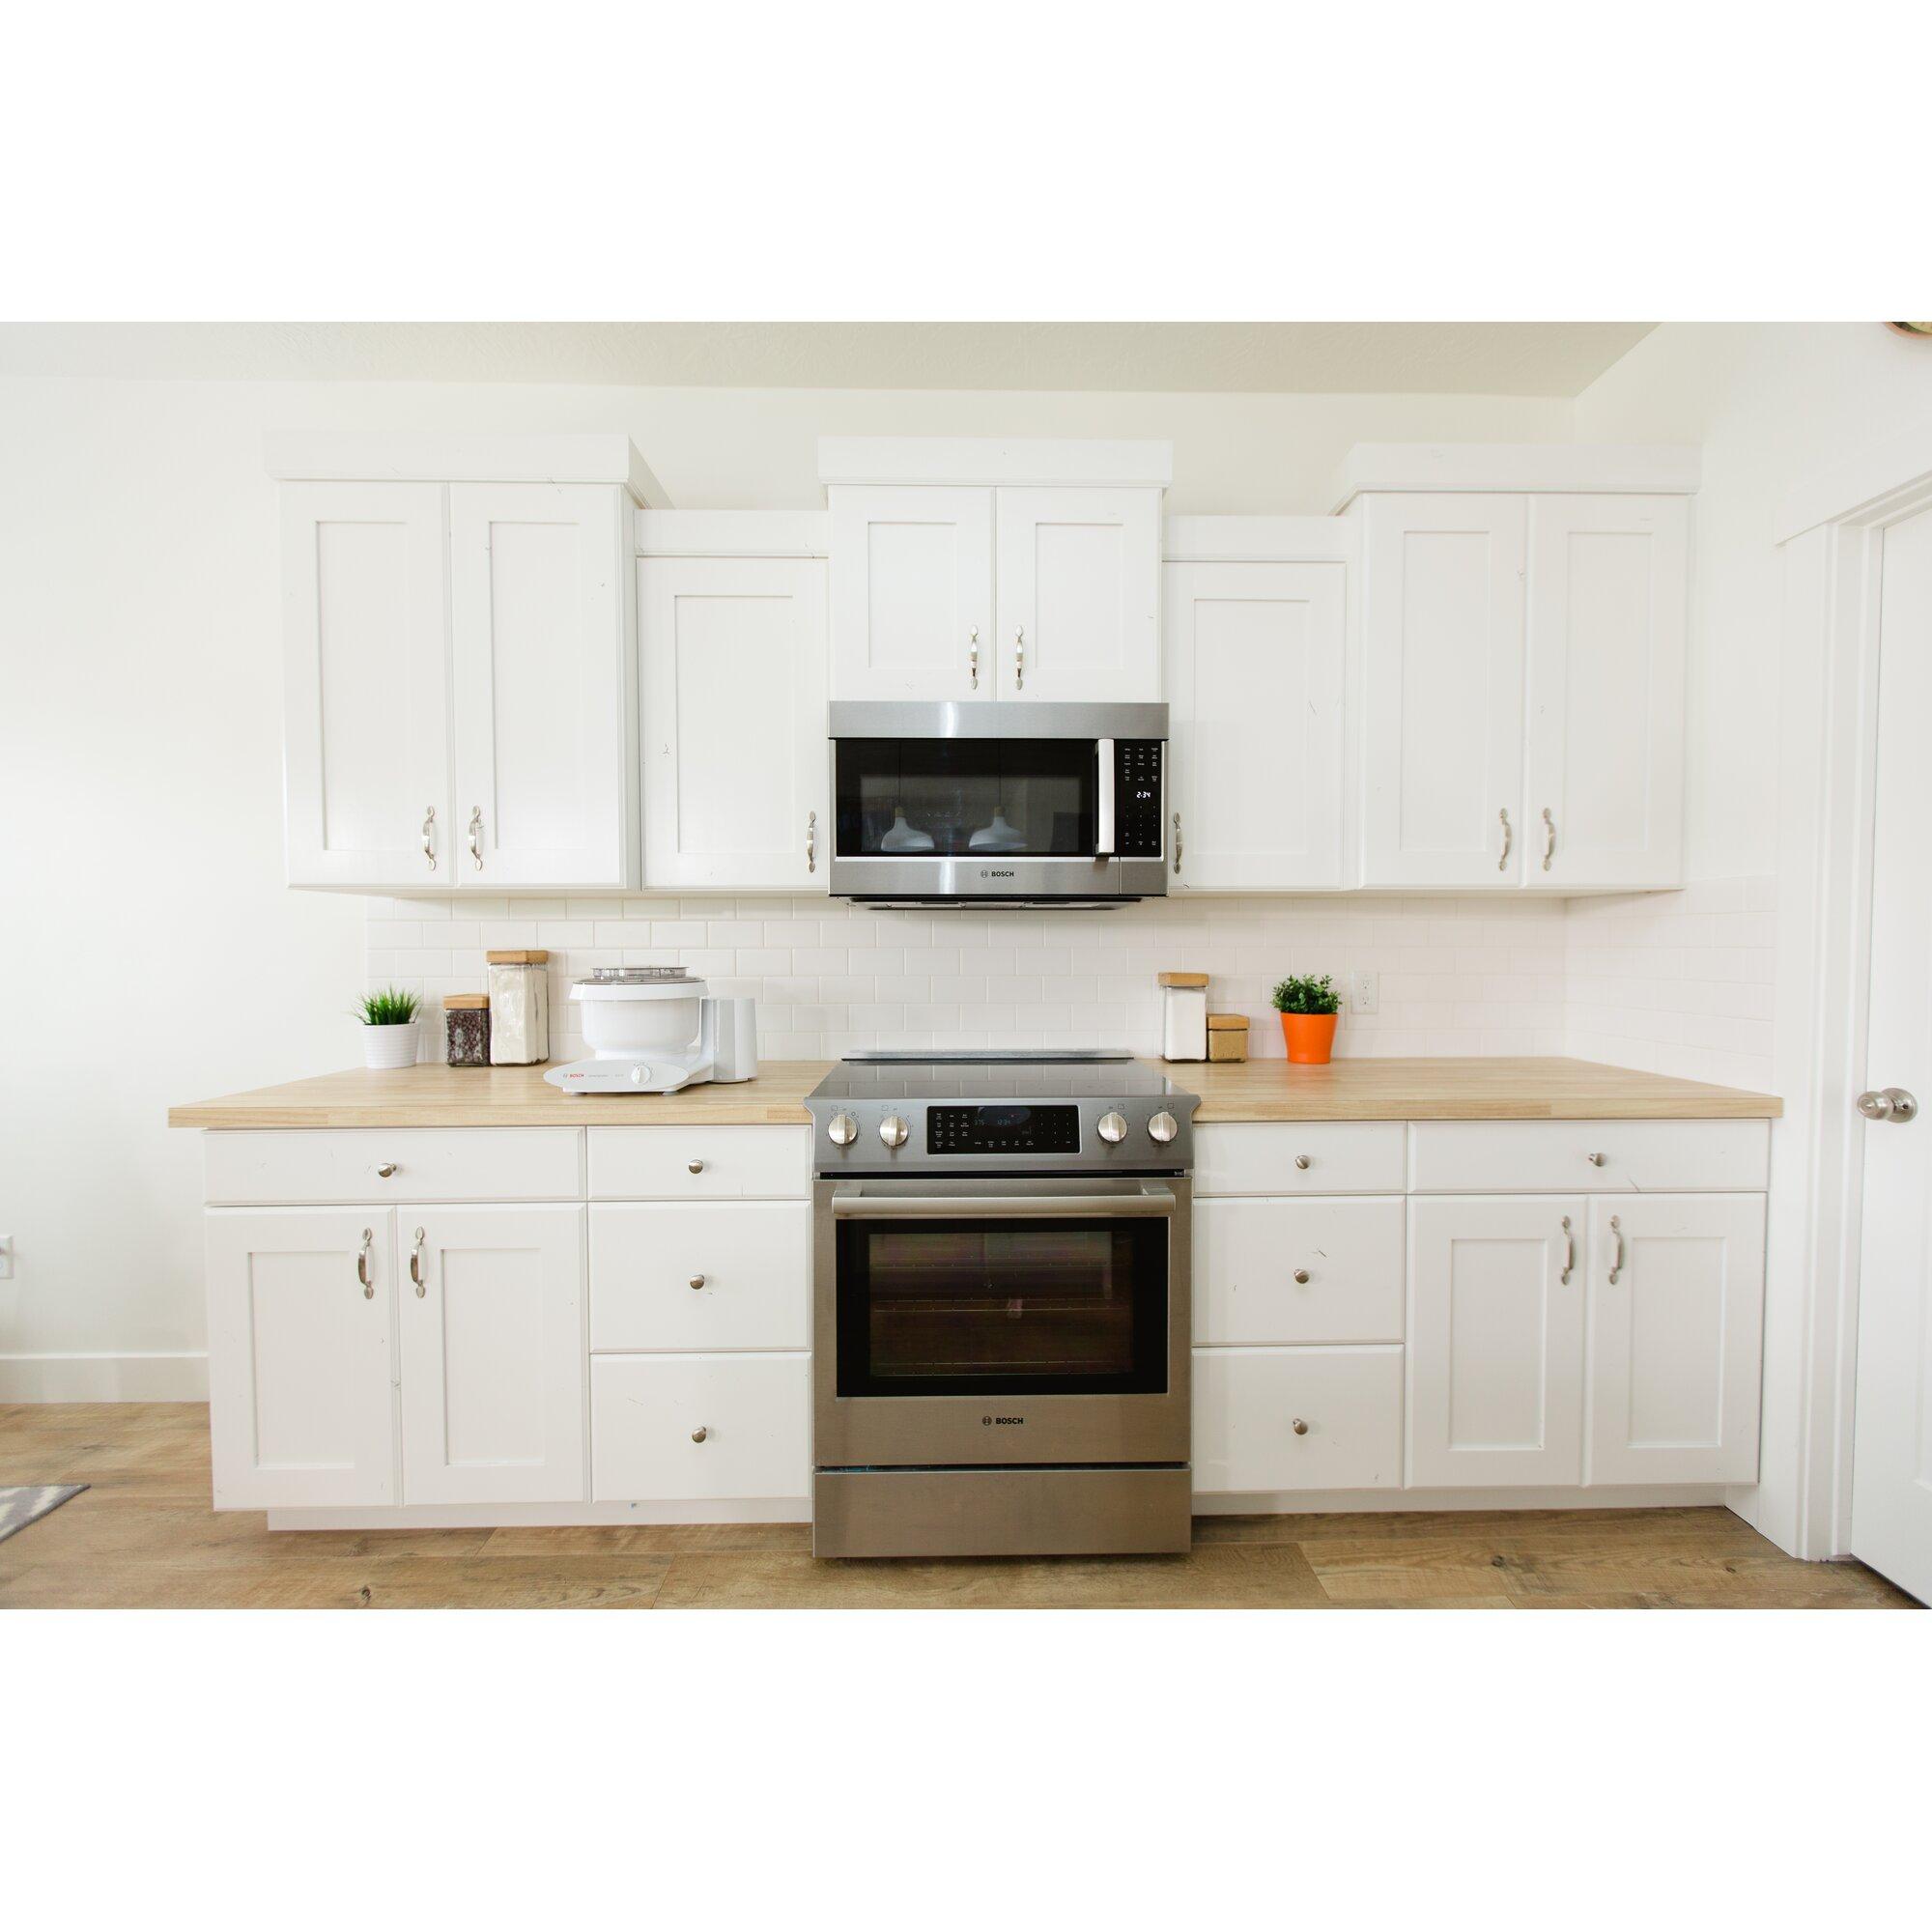 Kitchenaid 5 Qt Scraper Bowl Attachment